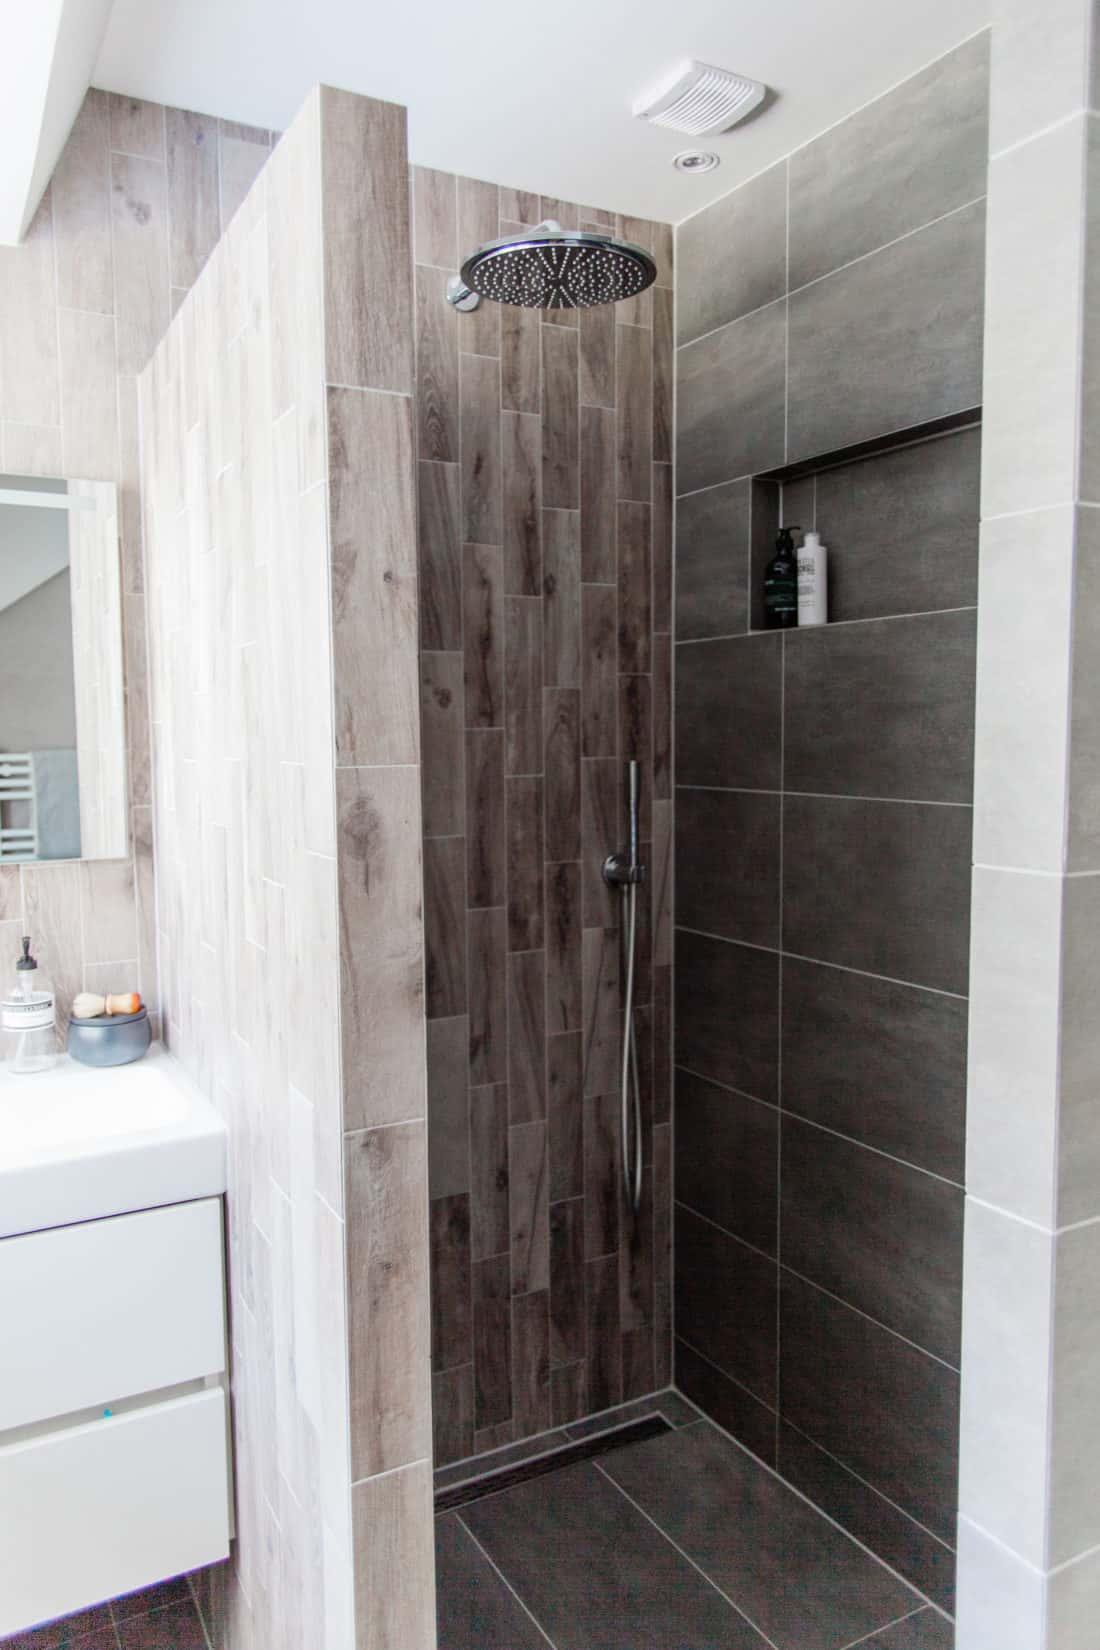 Interieurontwerp bovenverdieping jaren dertig woning douche